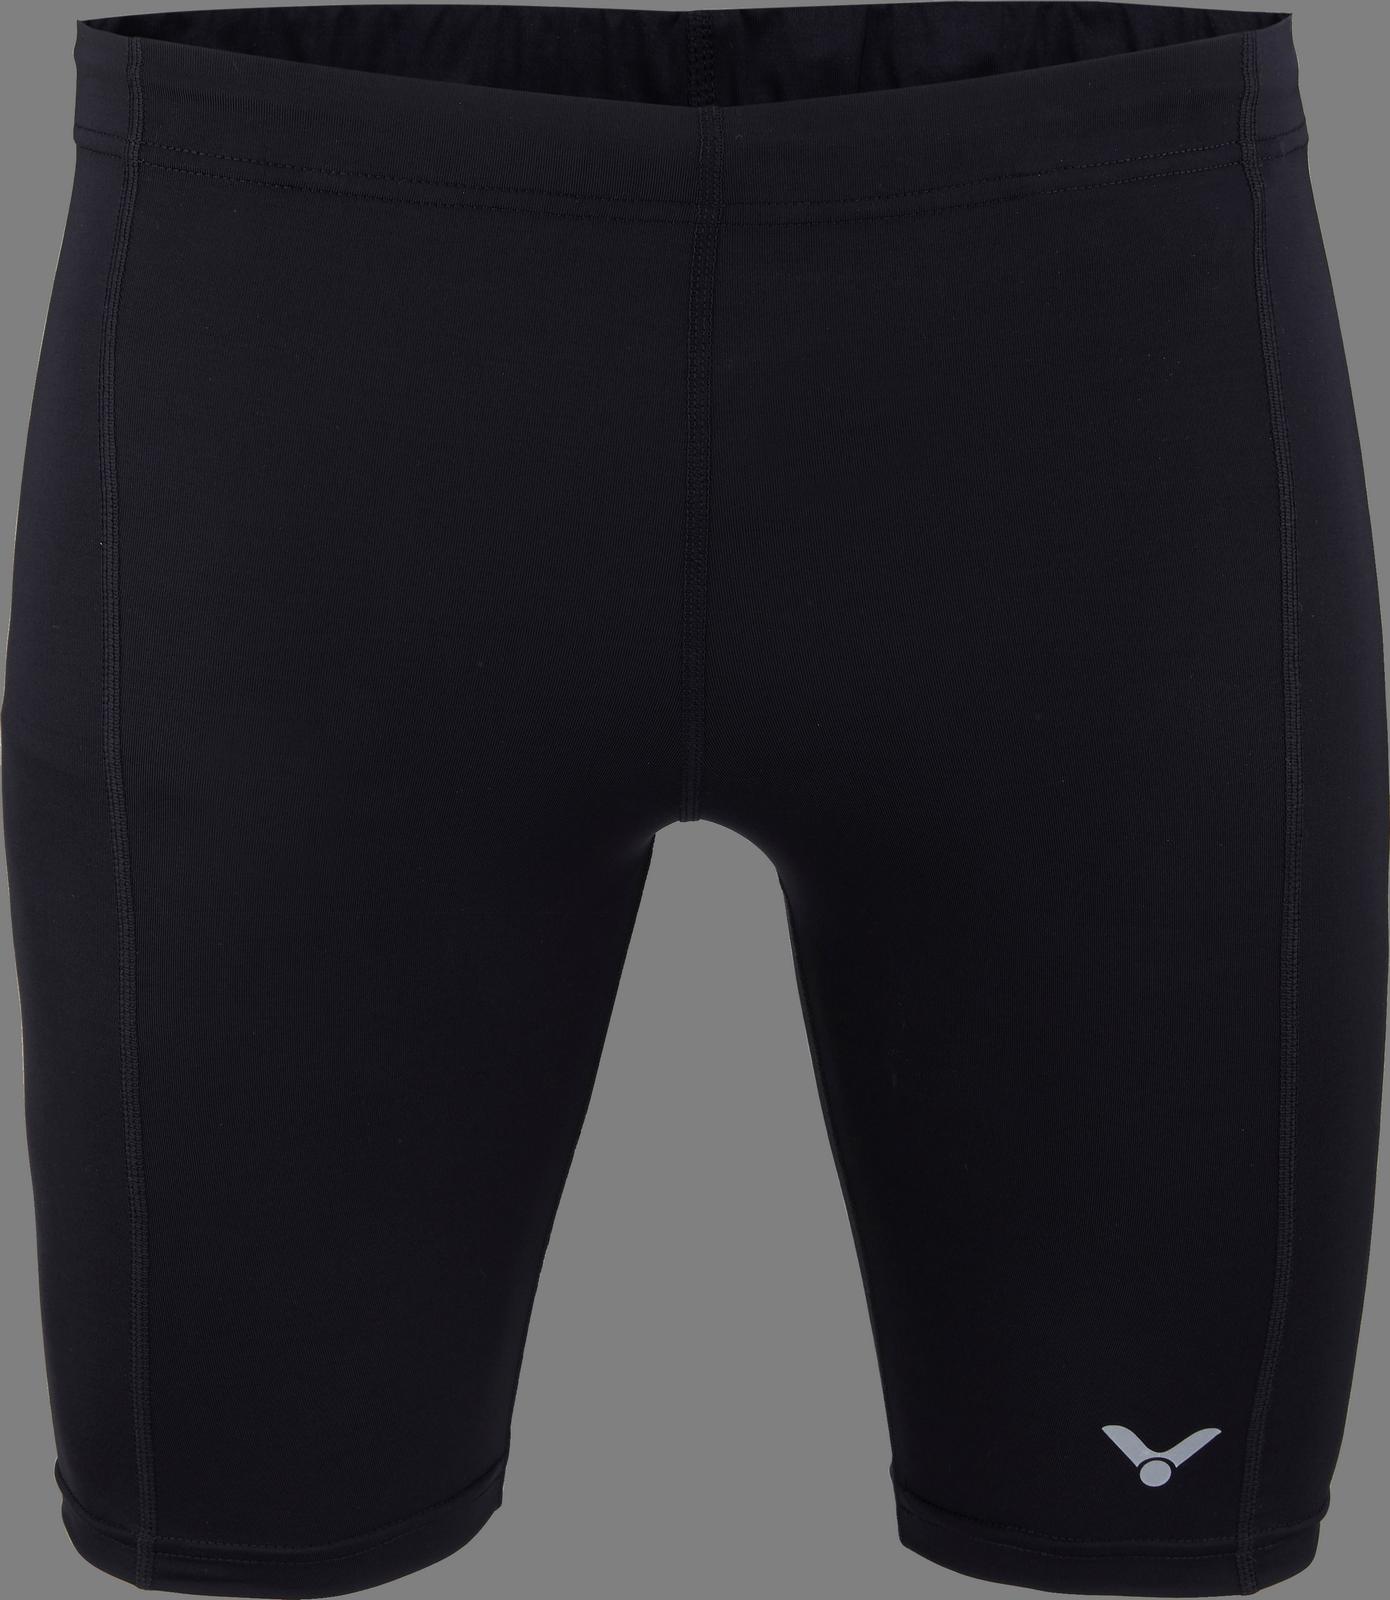 VICTOR Compression Shorts uni schwarz 5718